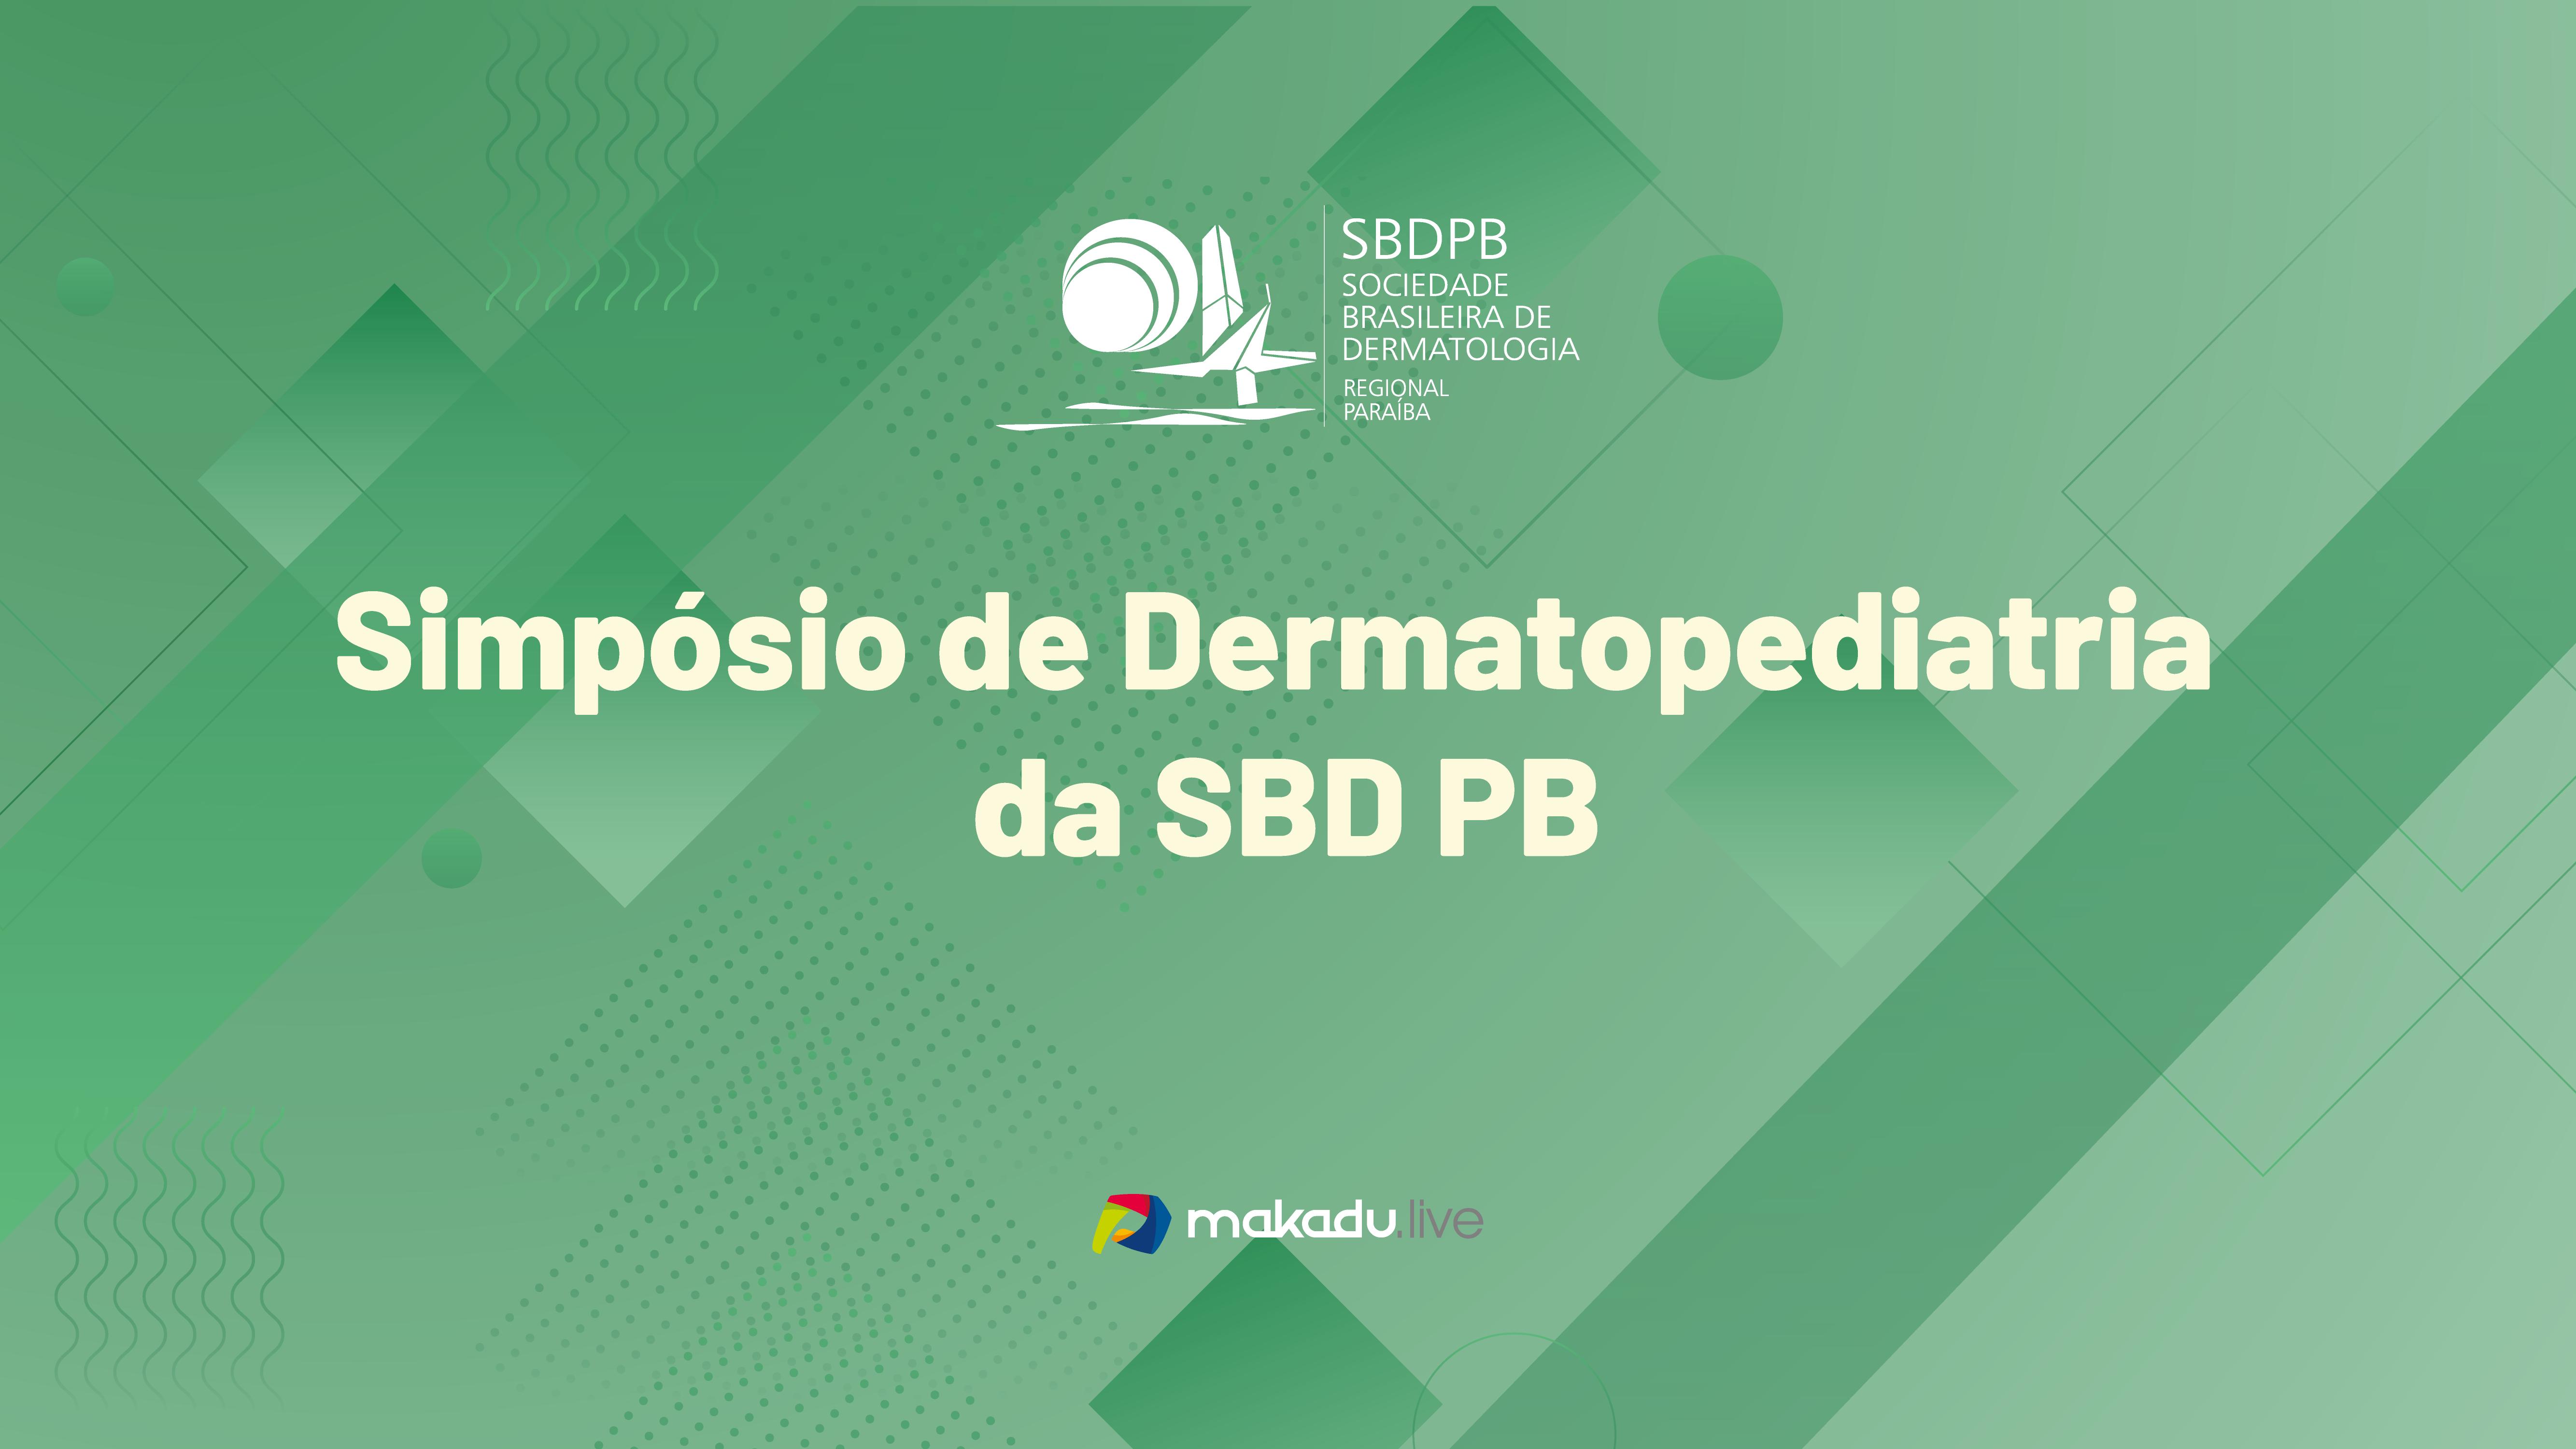 Simpósio Dermatopediatria da SBD PB